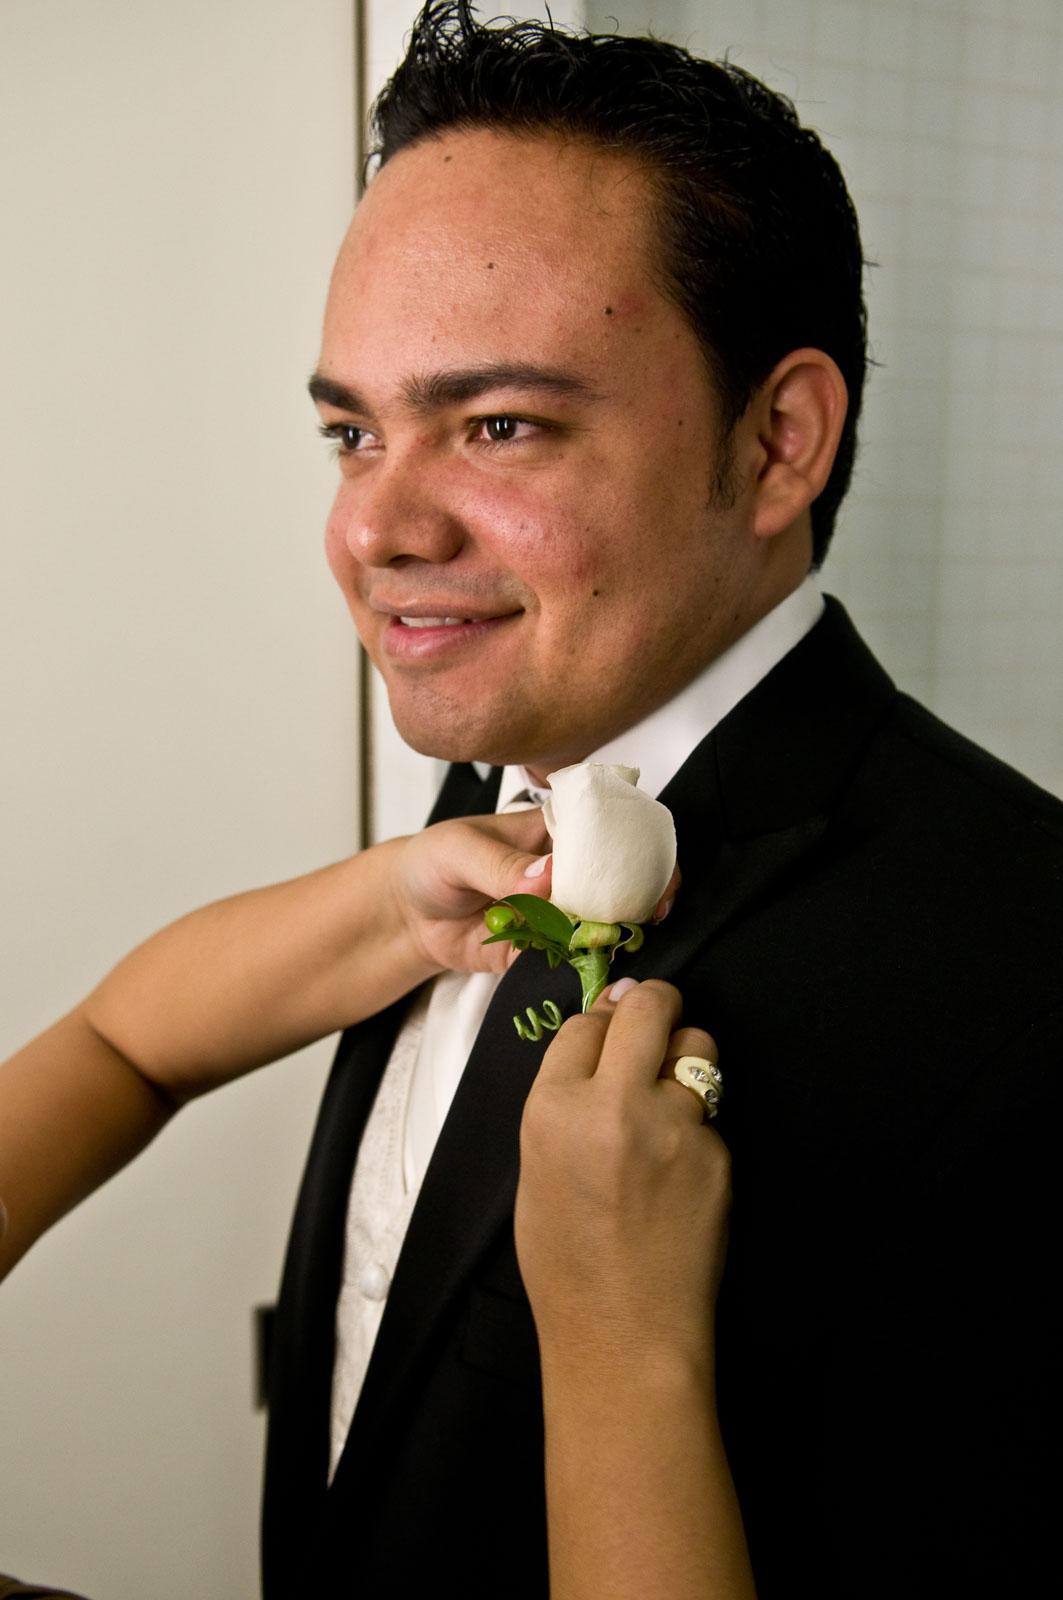 Wedding027__DSC1684.jpg